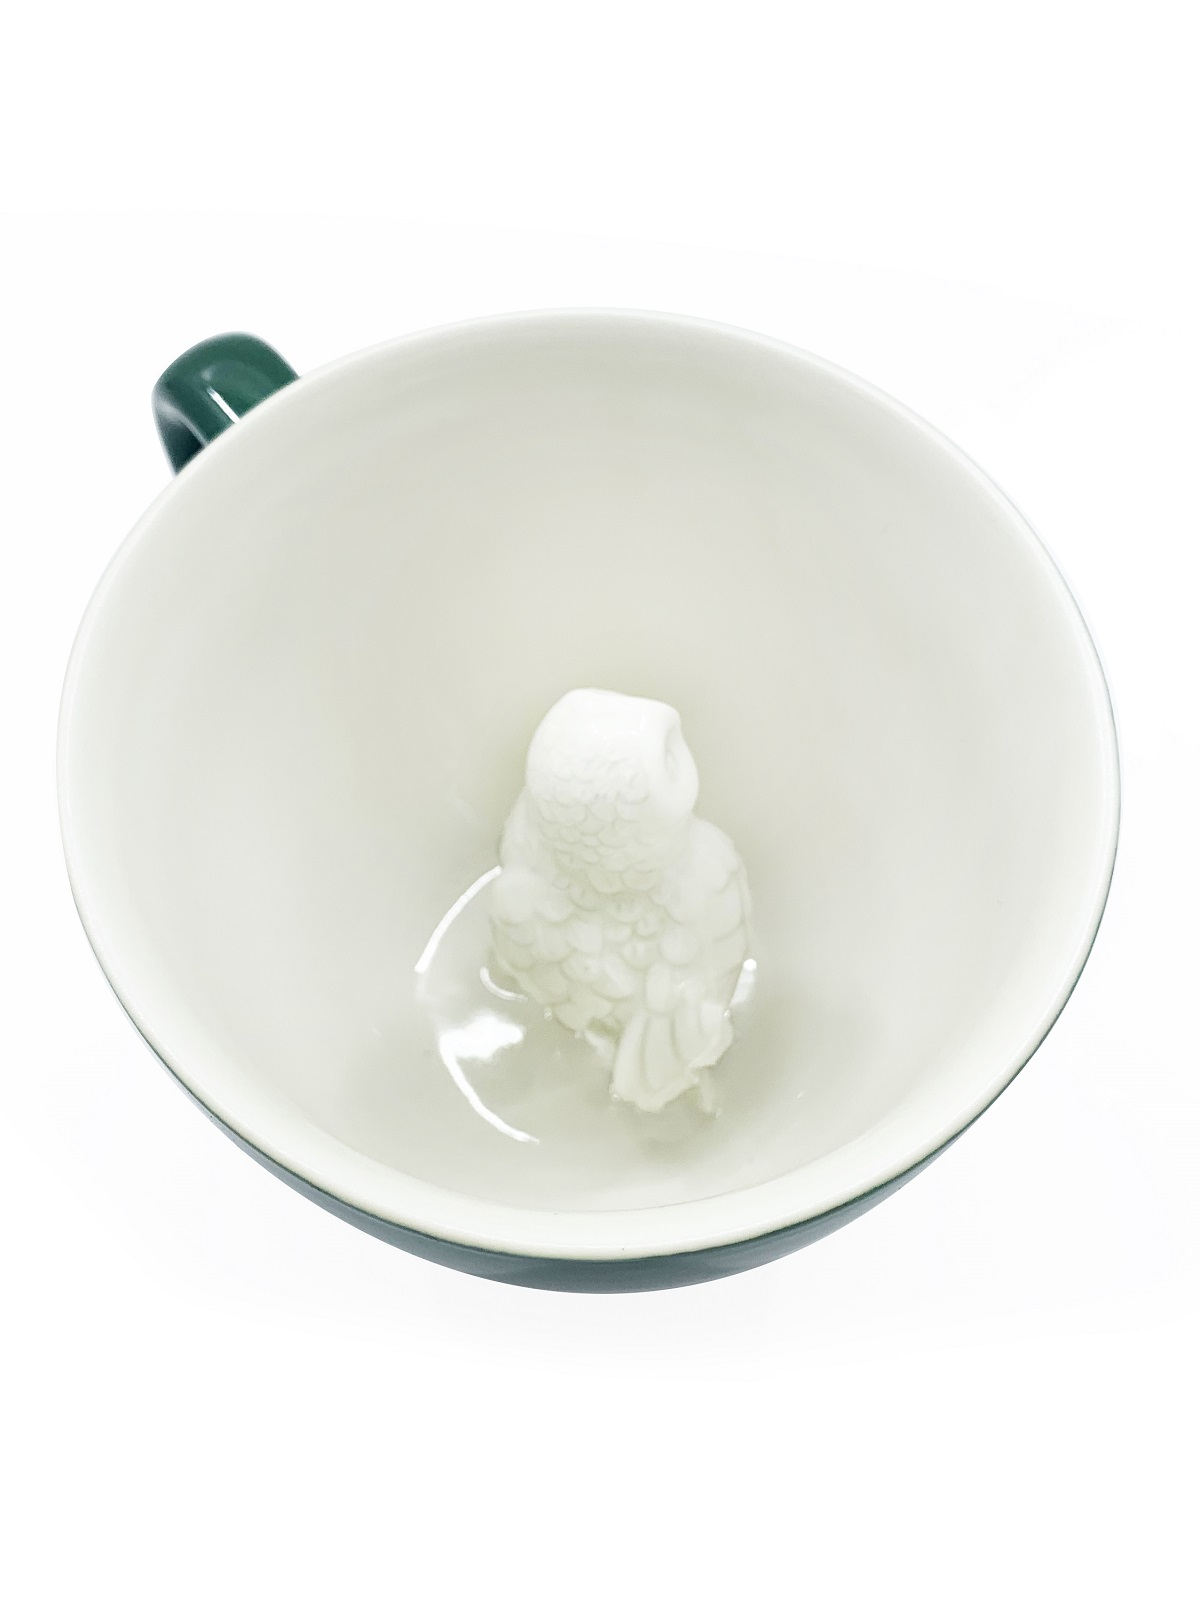 Пинкл (Pinkl)   Кружка с совой   Creature Cups Owl Emerald